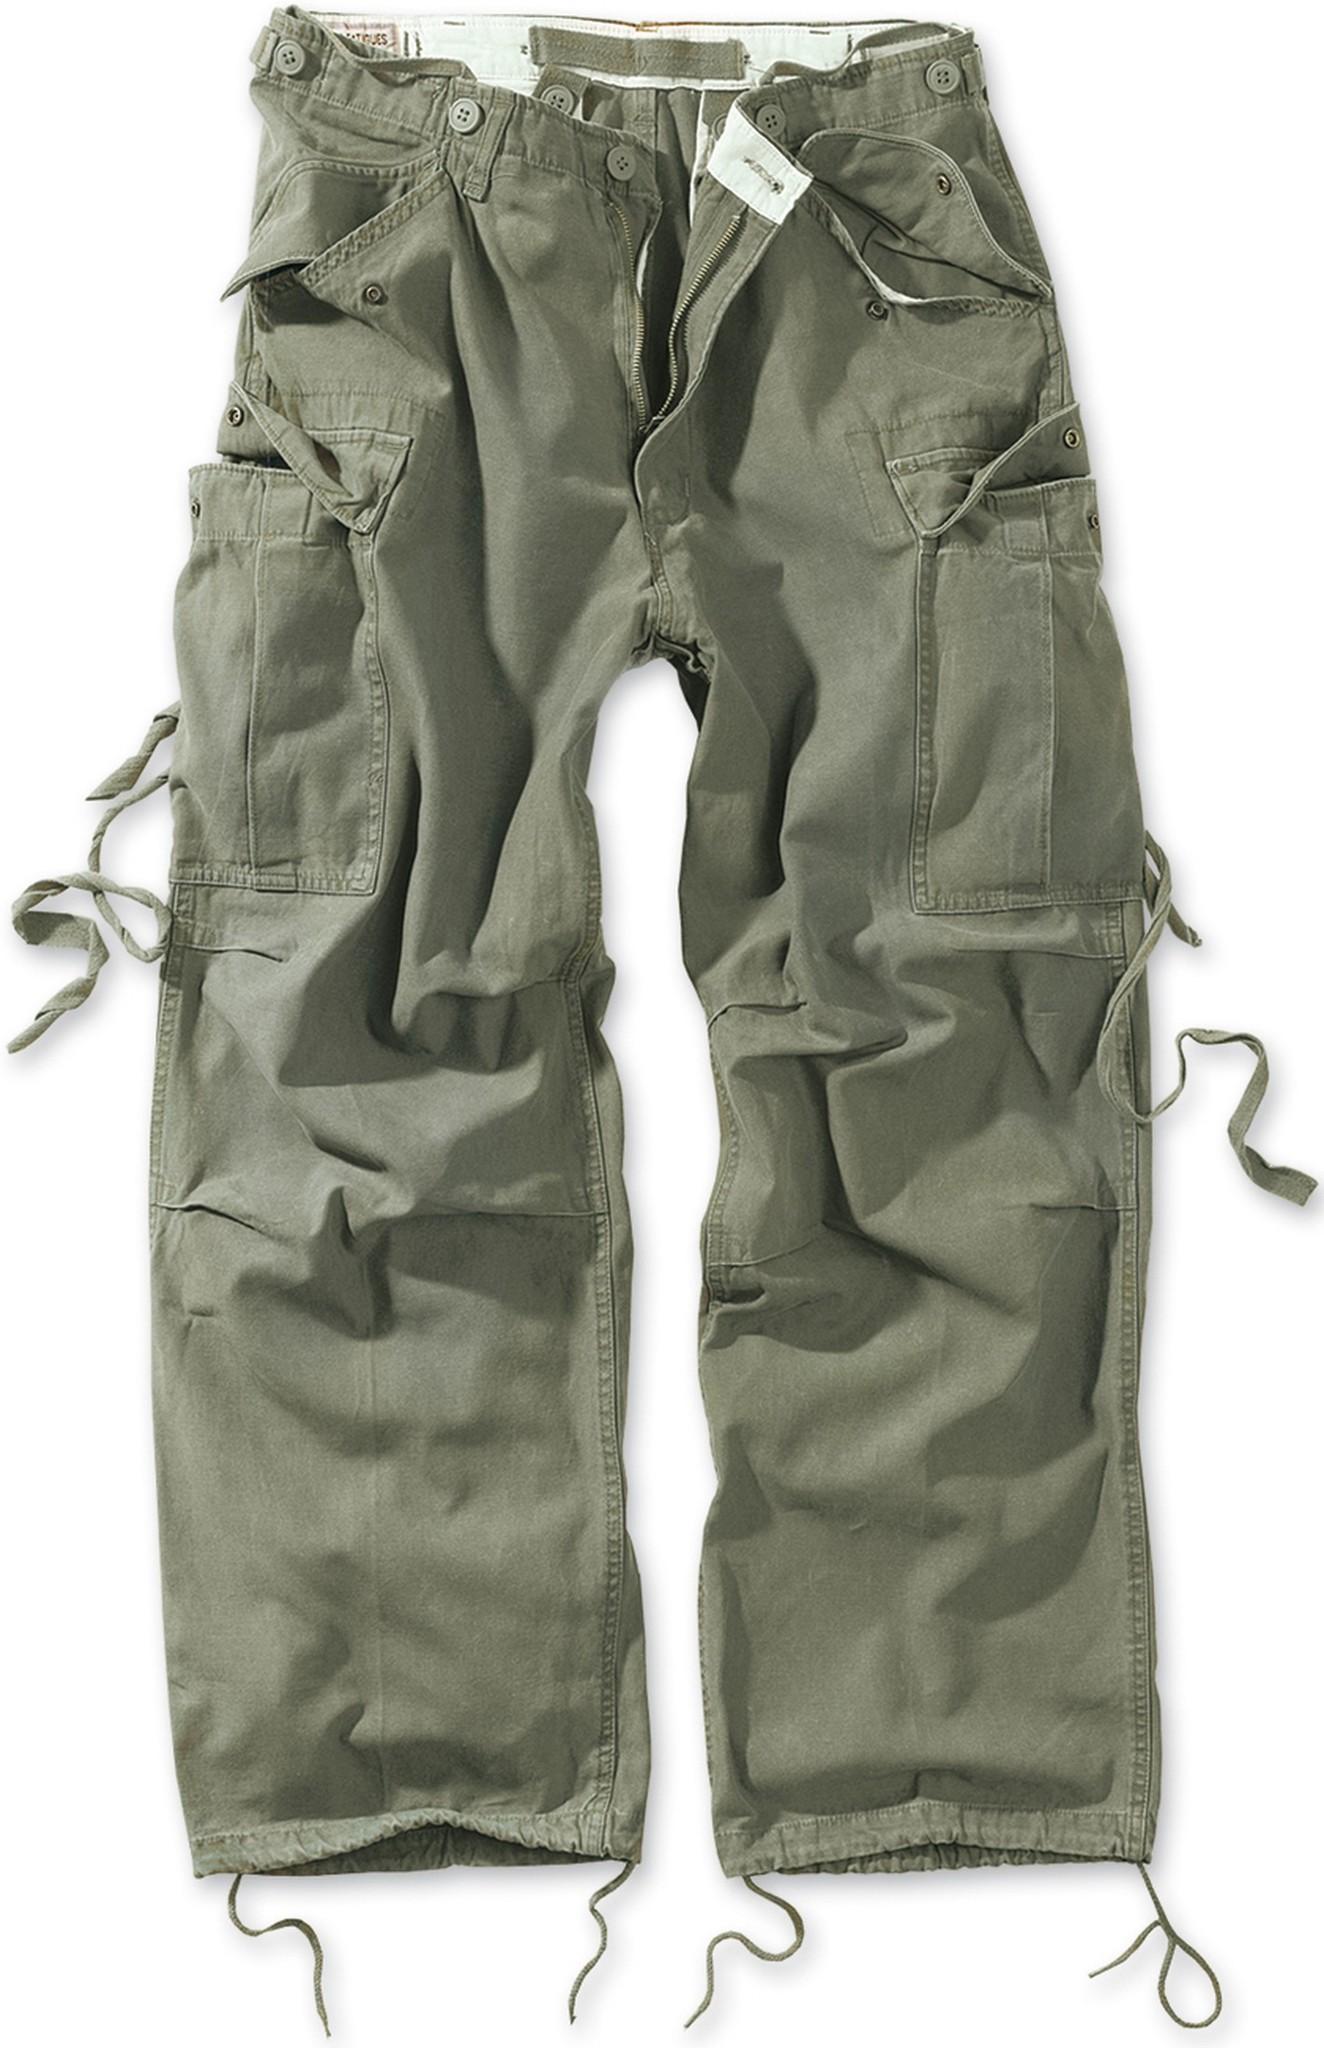 Брюки карго  Surplus Vintage Fatigues Trousers (олива - olive)